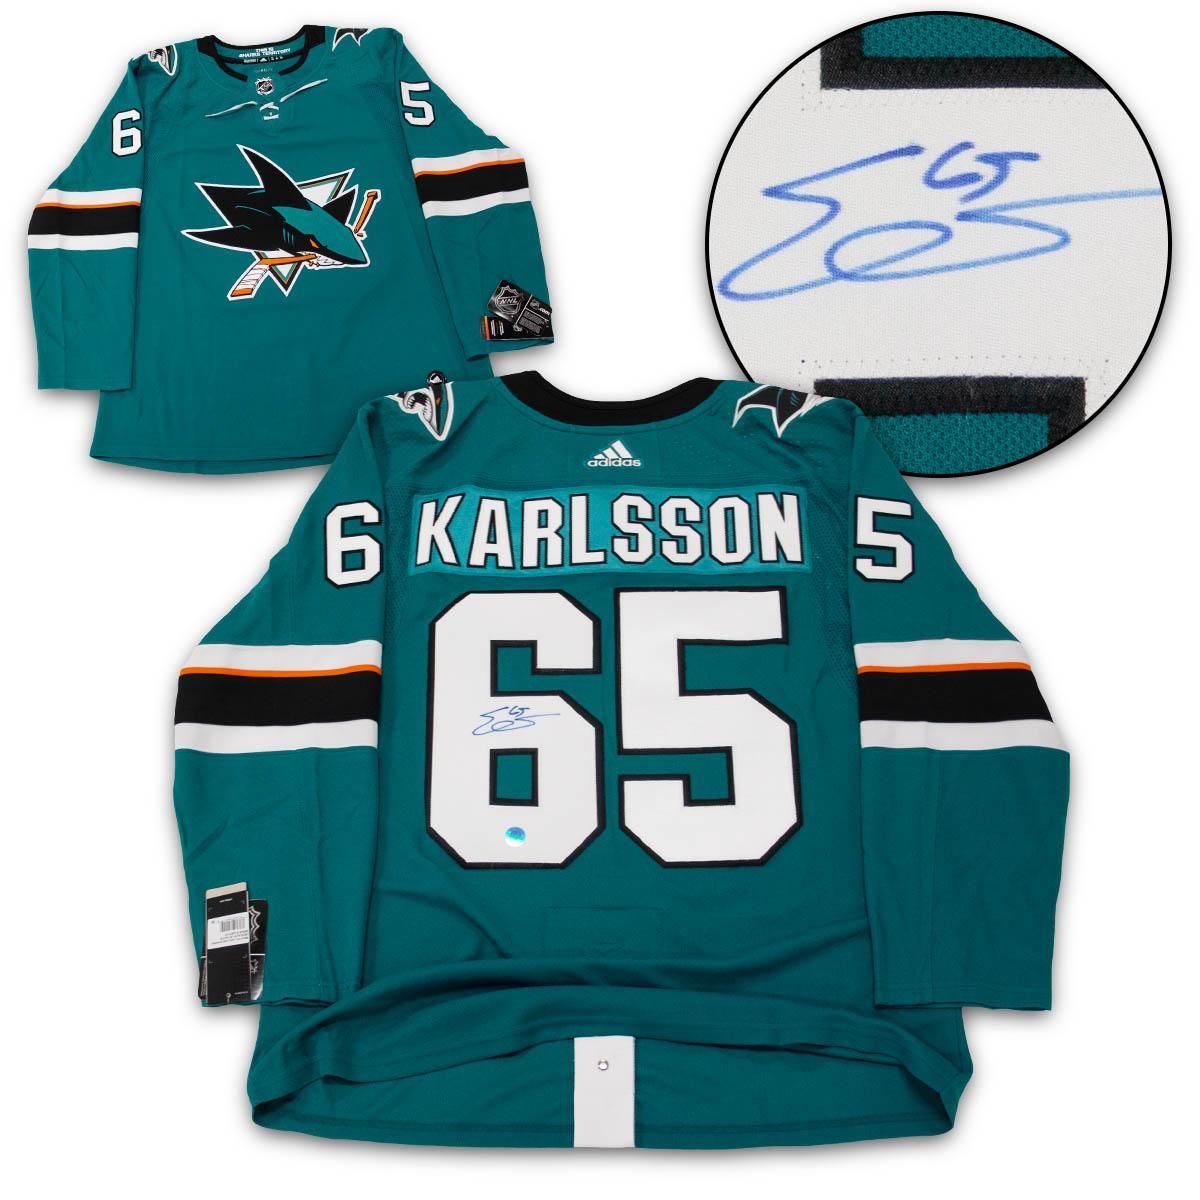 98856daf56c Erik Karlsson Signed Jersey - San Jose Sharks Adidas · The World ...